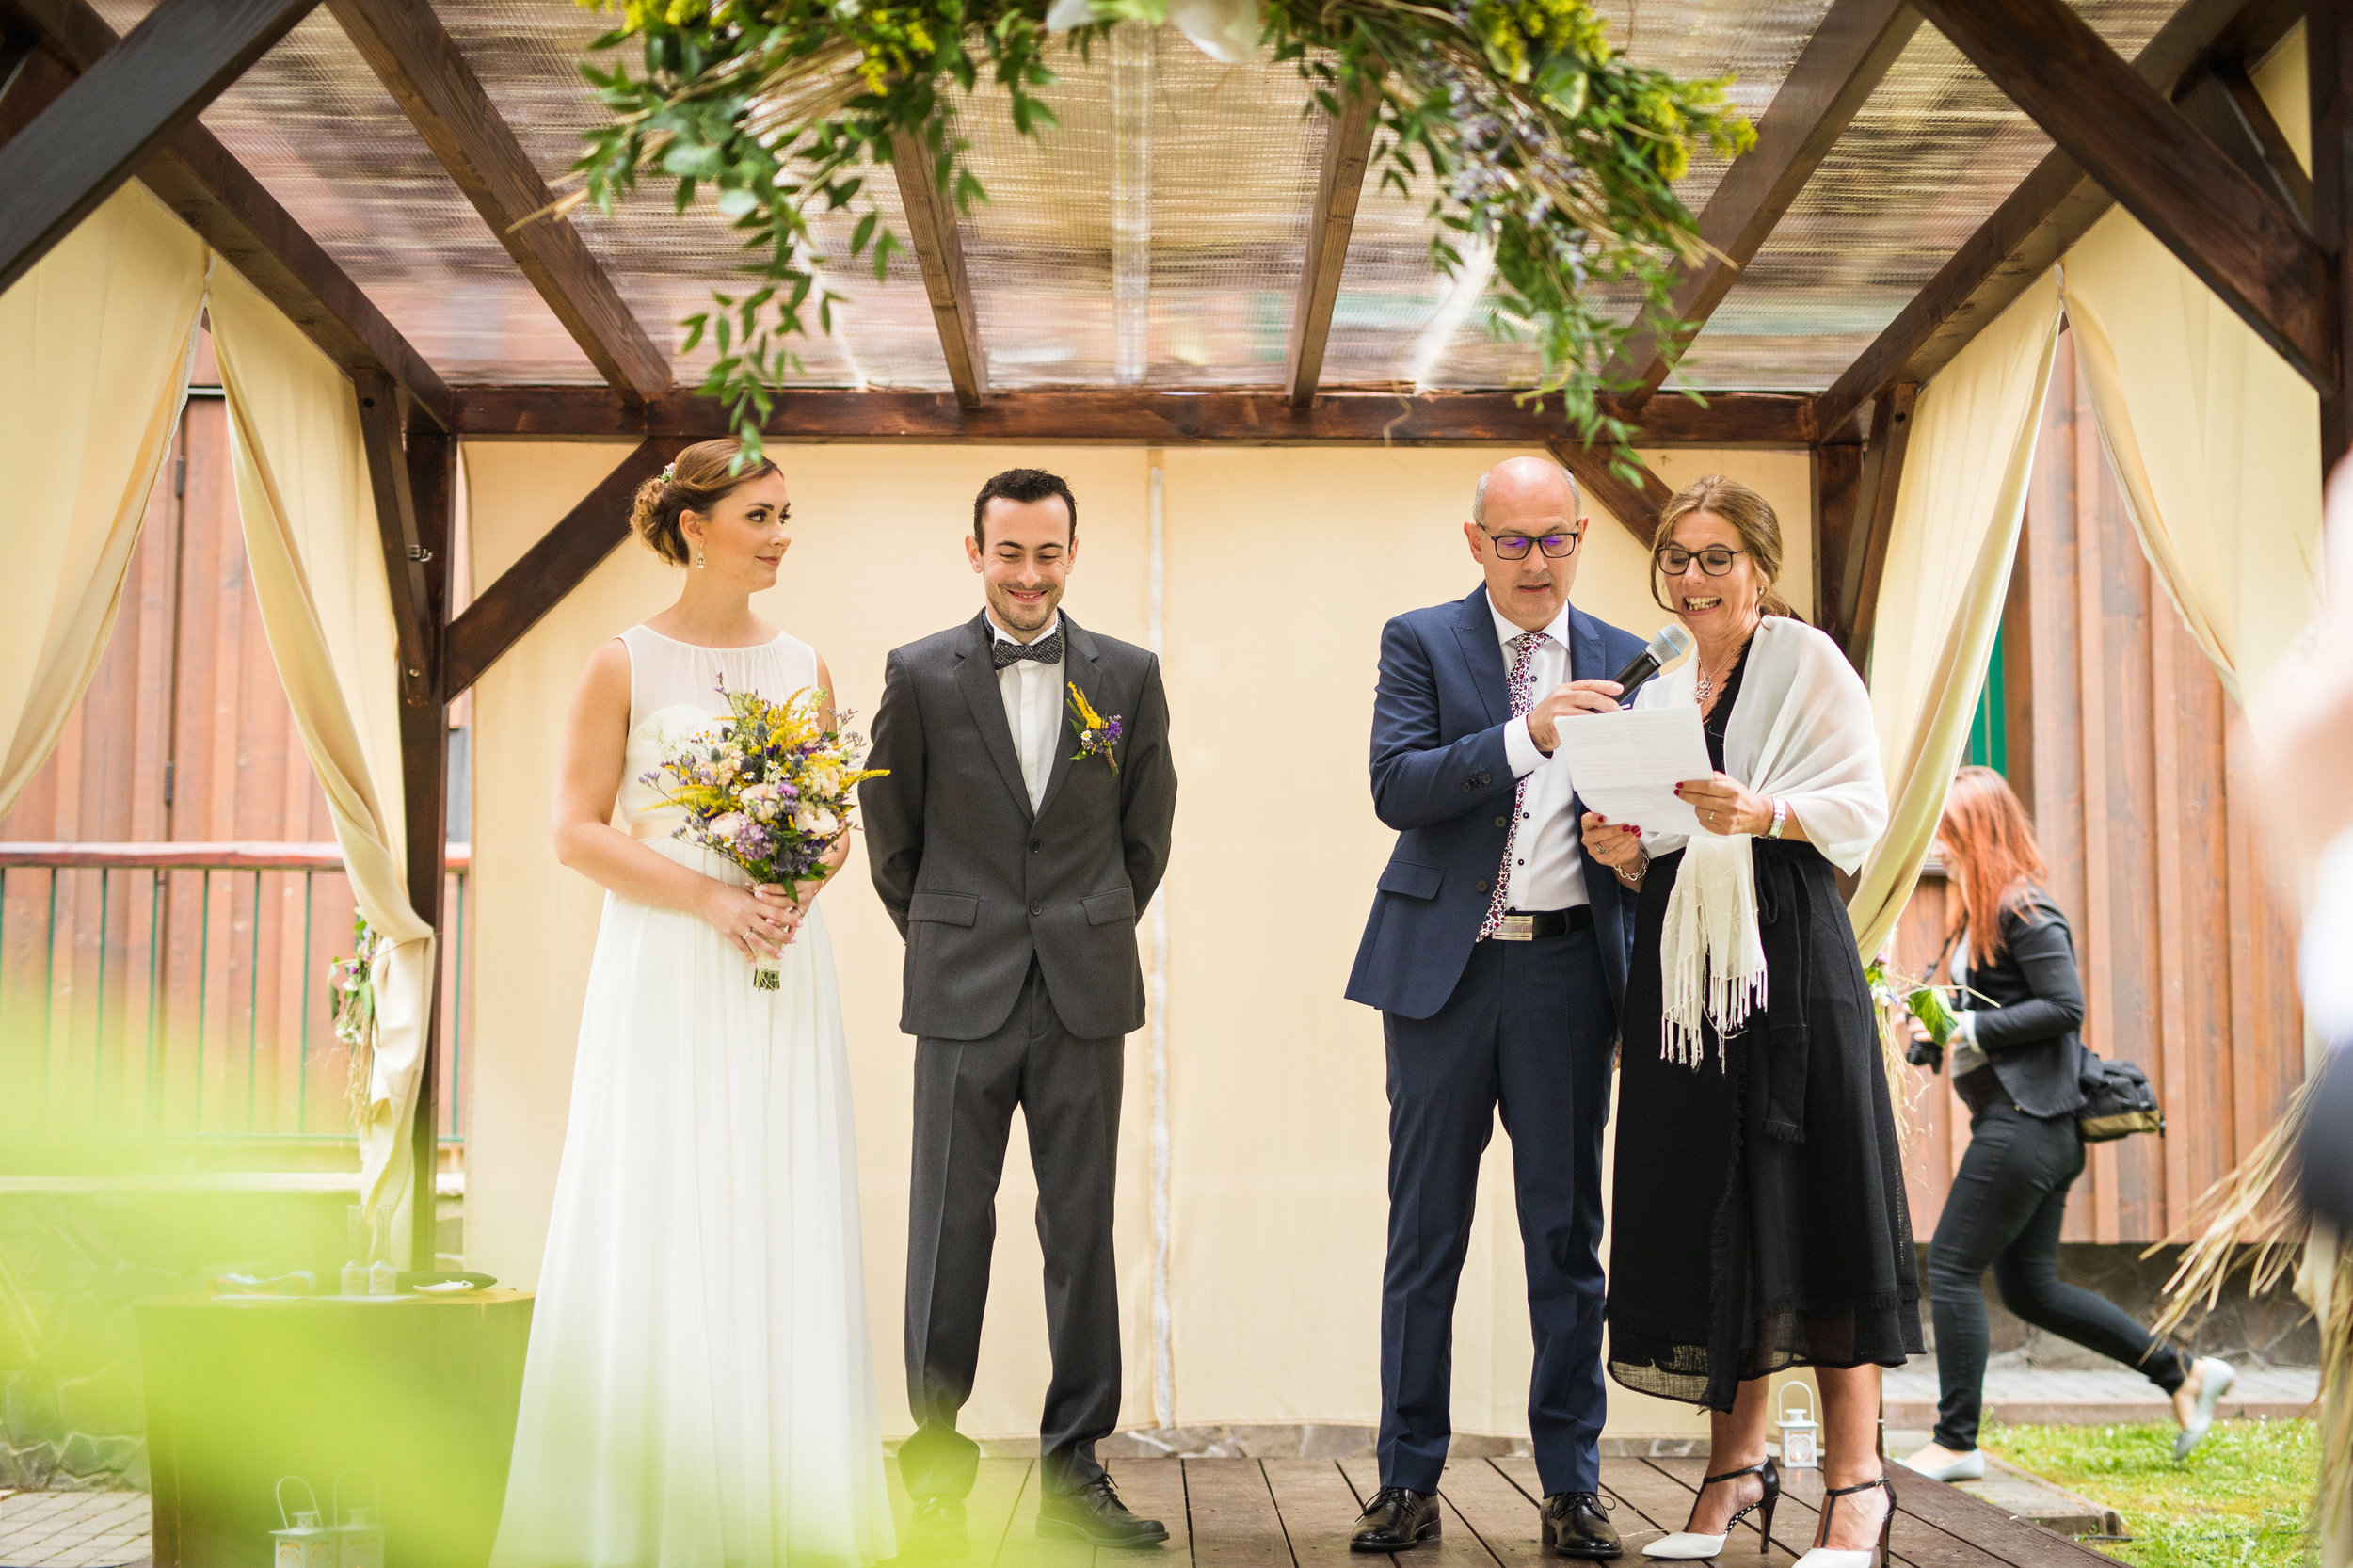 destination_wedding_photographer_ivan_bustor-1019.jpg